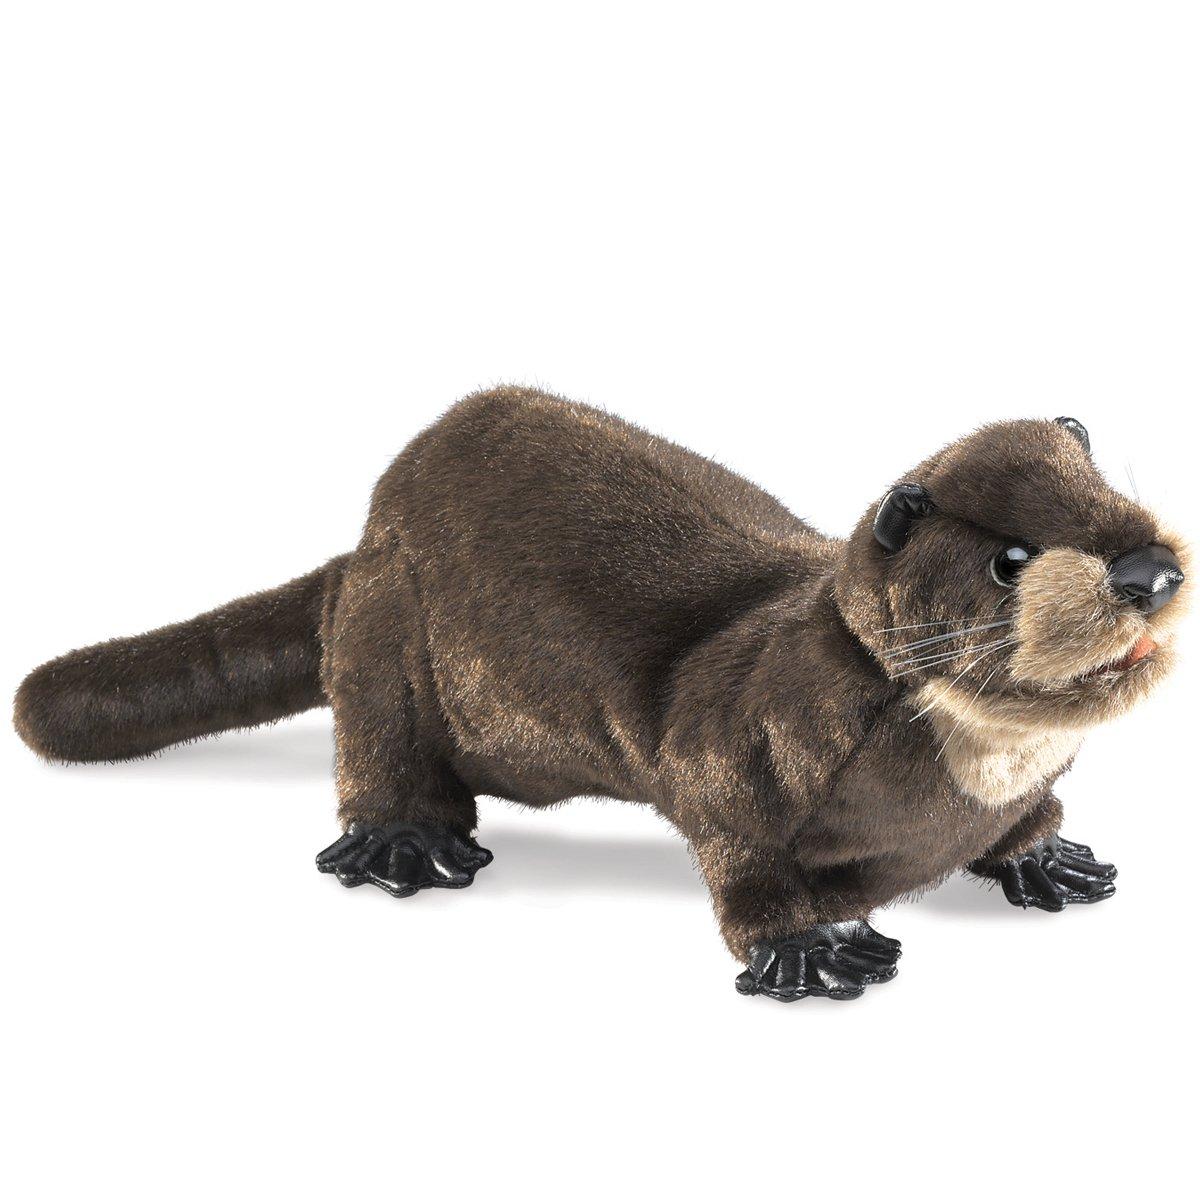 Folkmanis Puppets 2266 - Otter: Amazon.de: Spielzeug